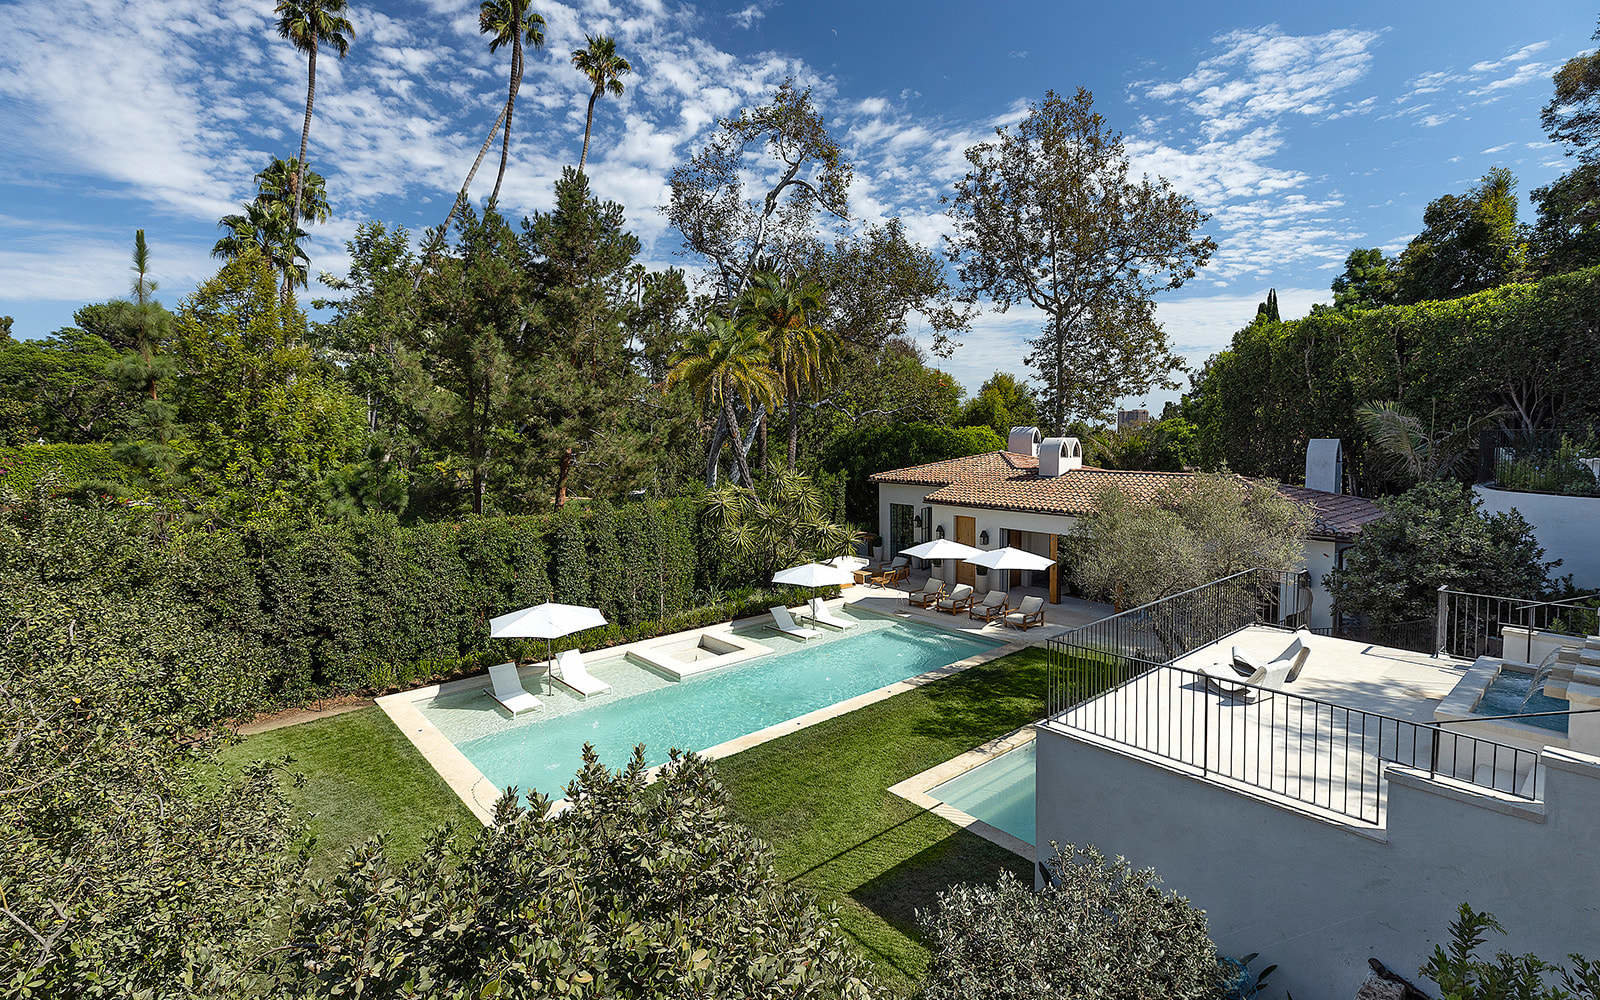 Travis Kalanick uber oprichter villa